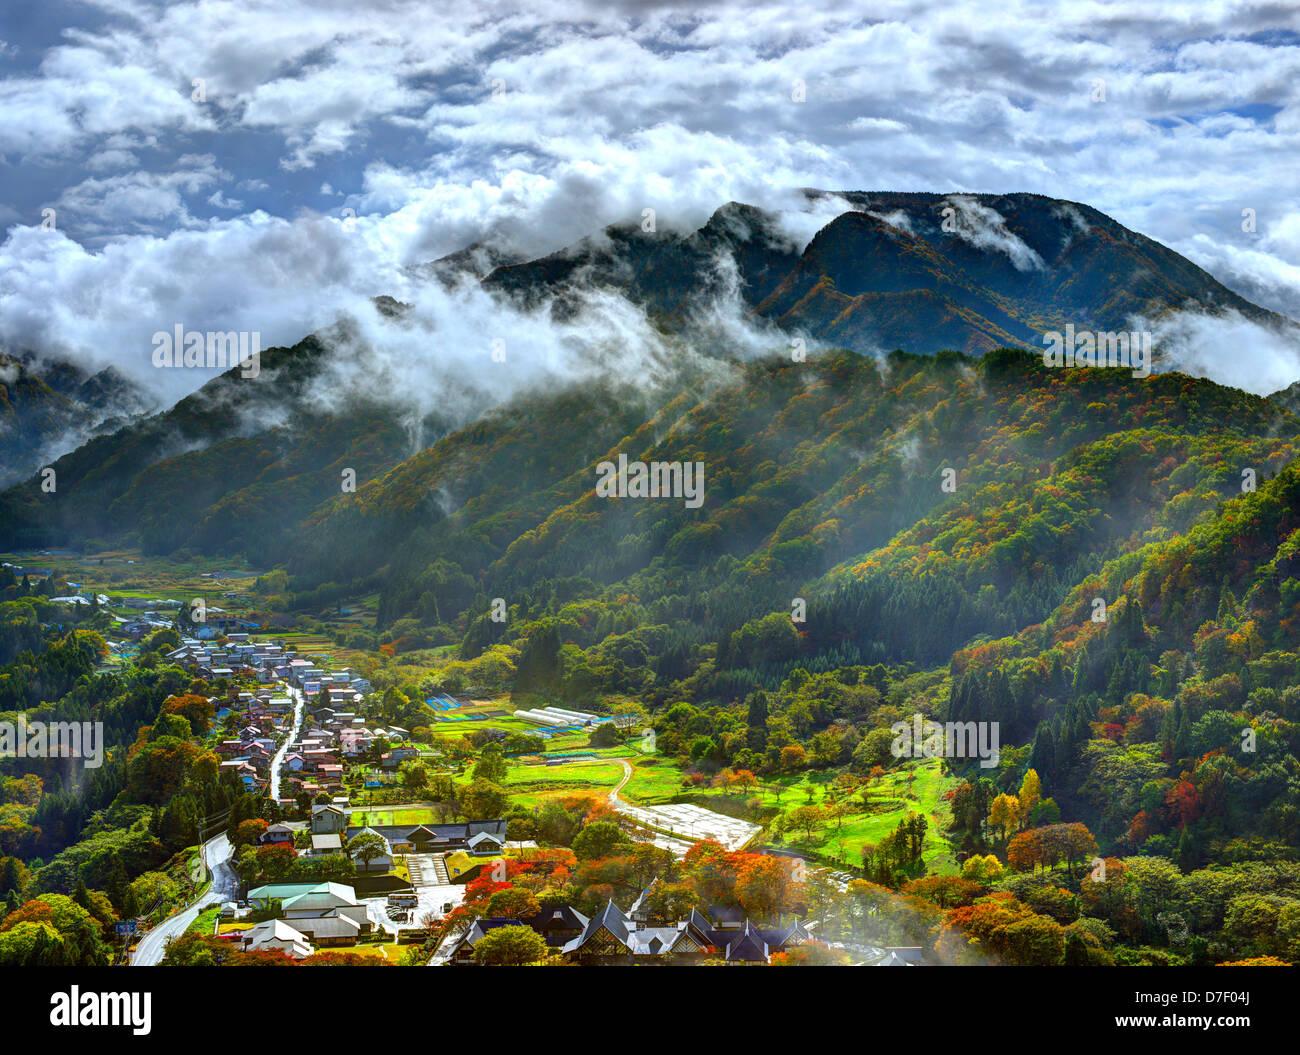 Valley in Yamadera, Yamagata, Japan. - Stock Image